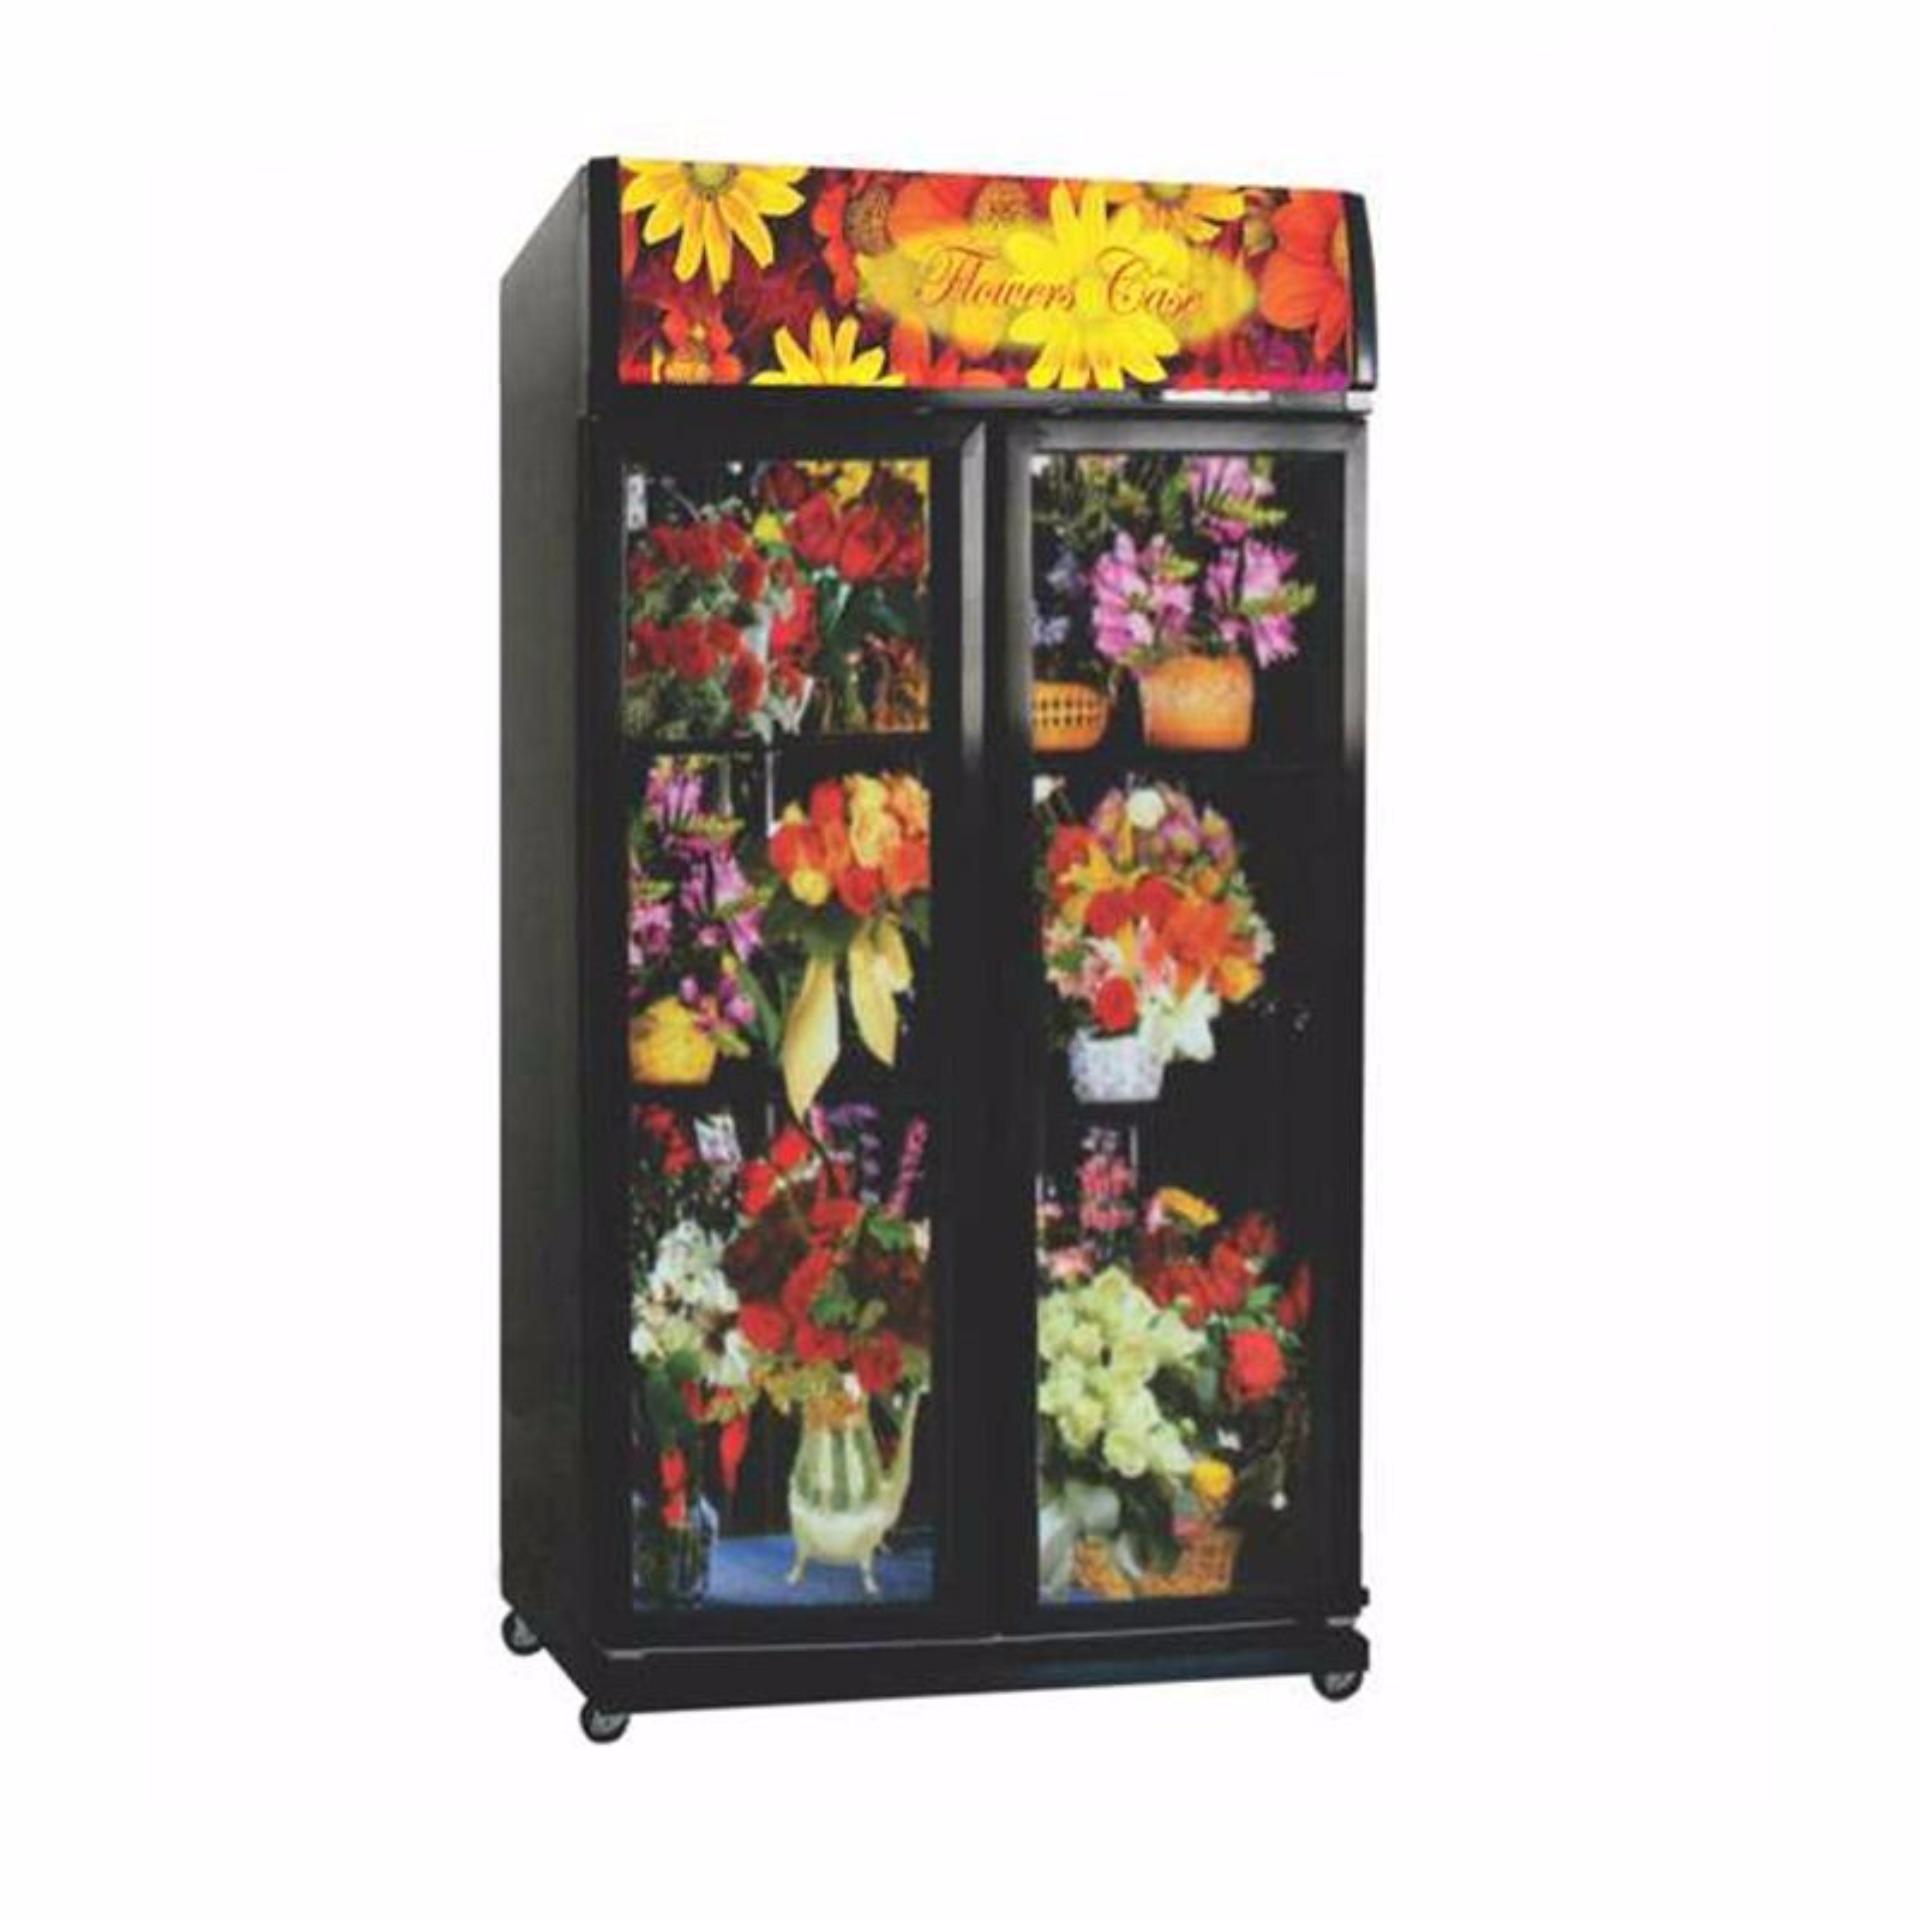 Gea Expo 37fc Display Cooler Showcase 282 Liter Silver Khusus Modena Sc 1281 280 Hitam Jabodetabek Flash Sale Flower 1050f